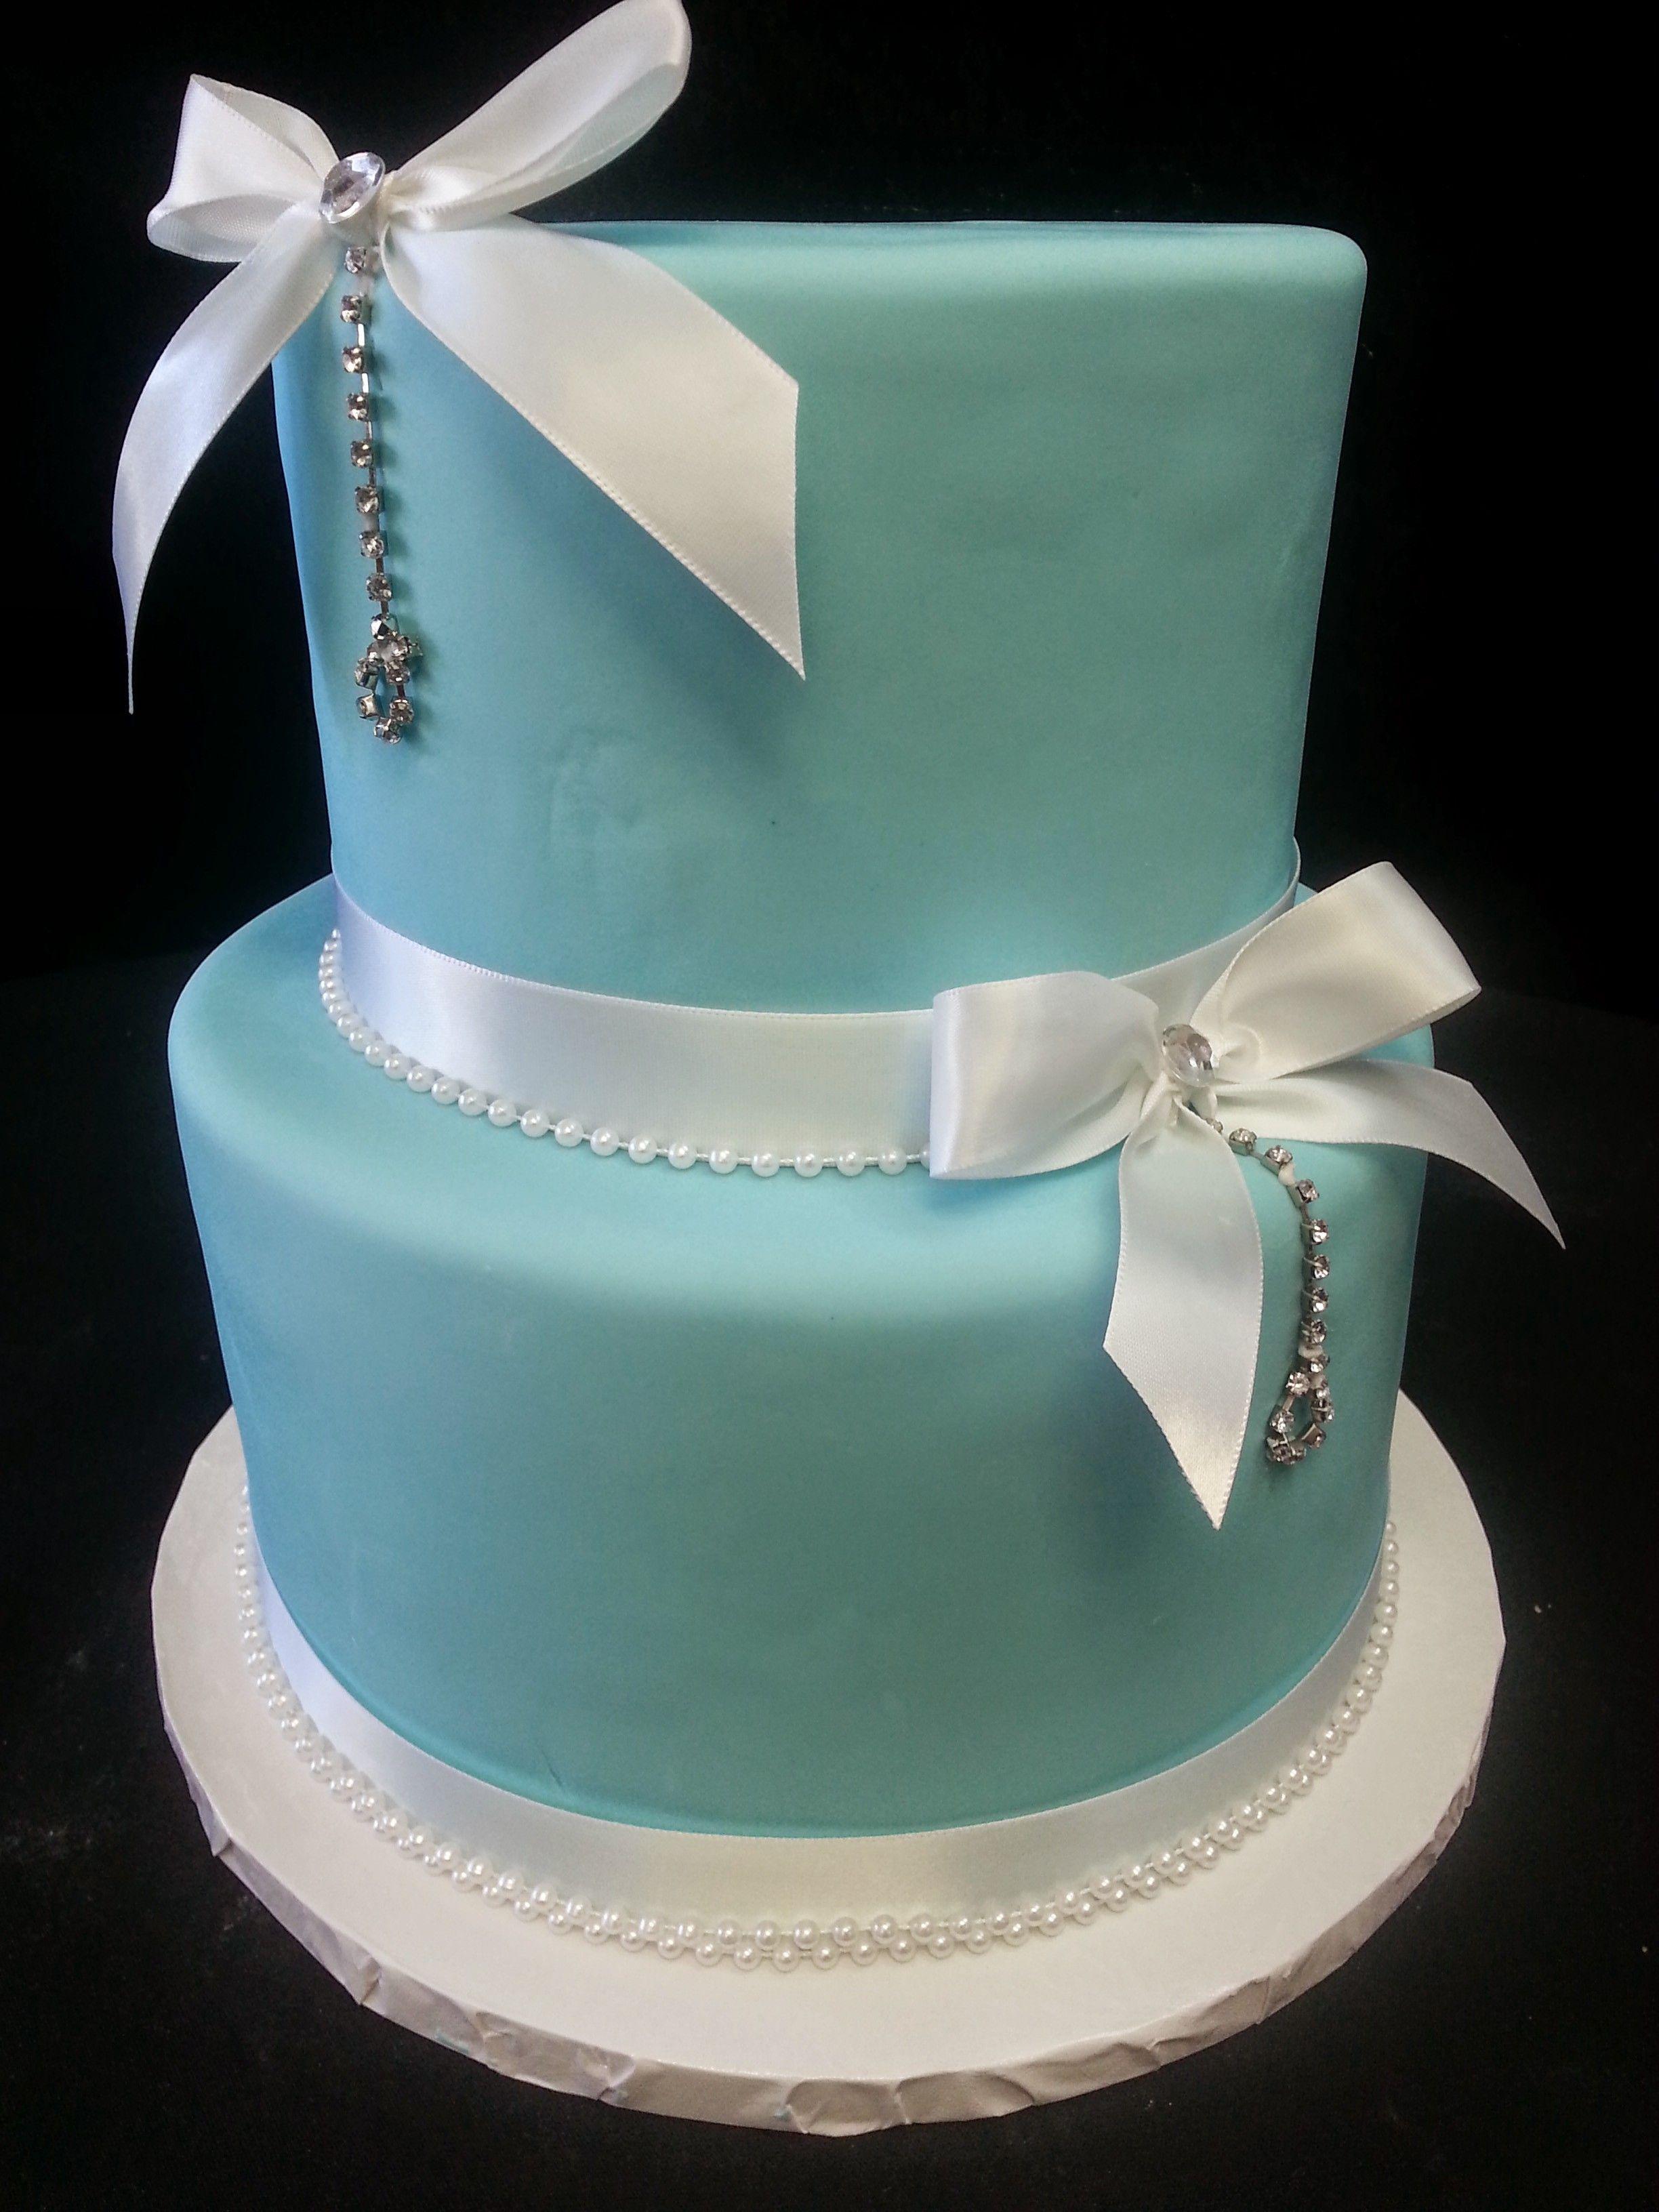 Cookie Jar Bakeshop I Custom Cakes I Birthday Cake I Tiffany Themed Birthday Cake I Tiffany Blue Cake